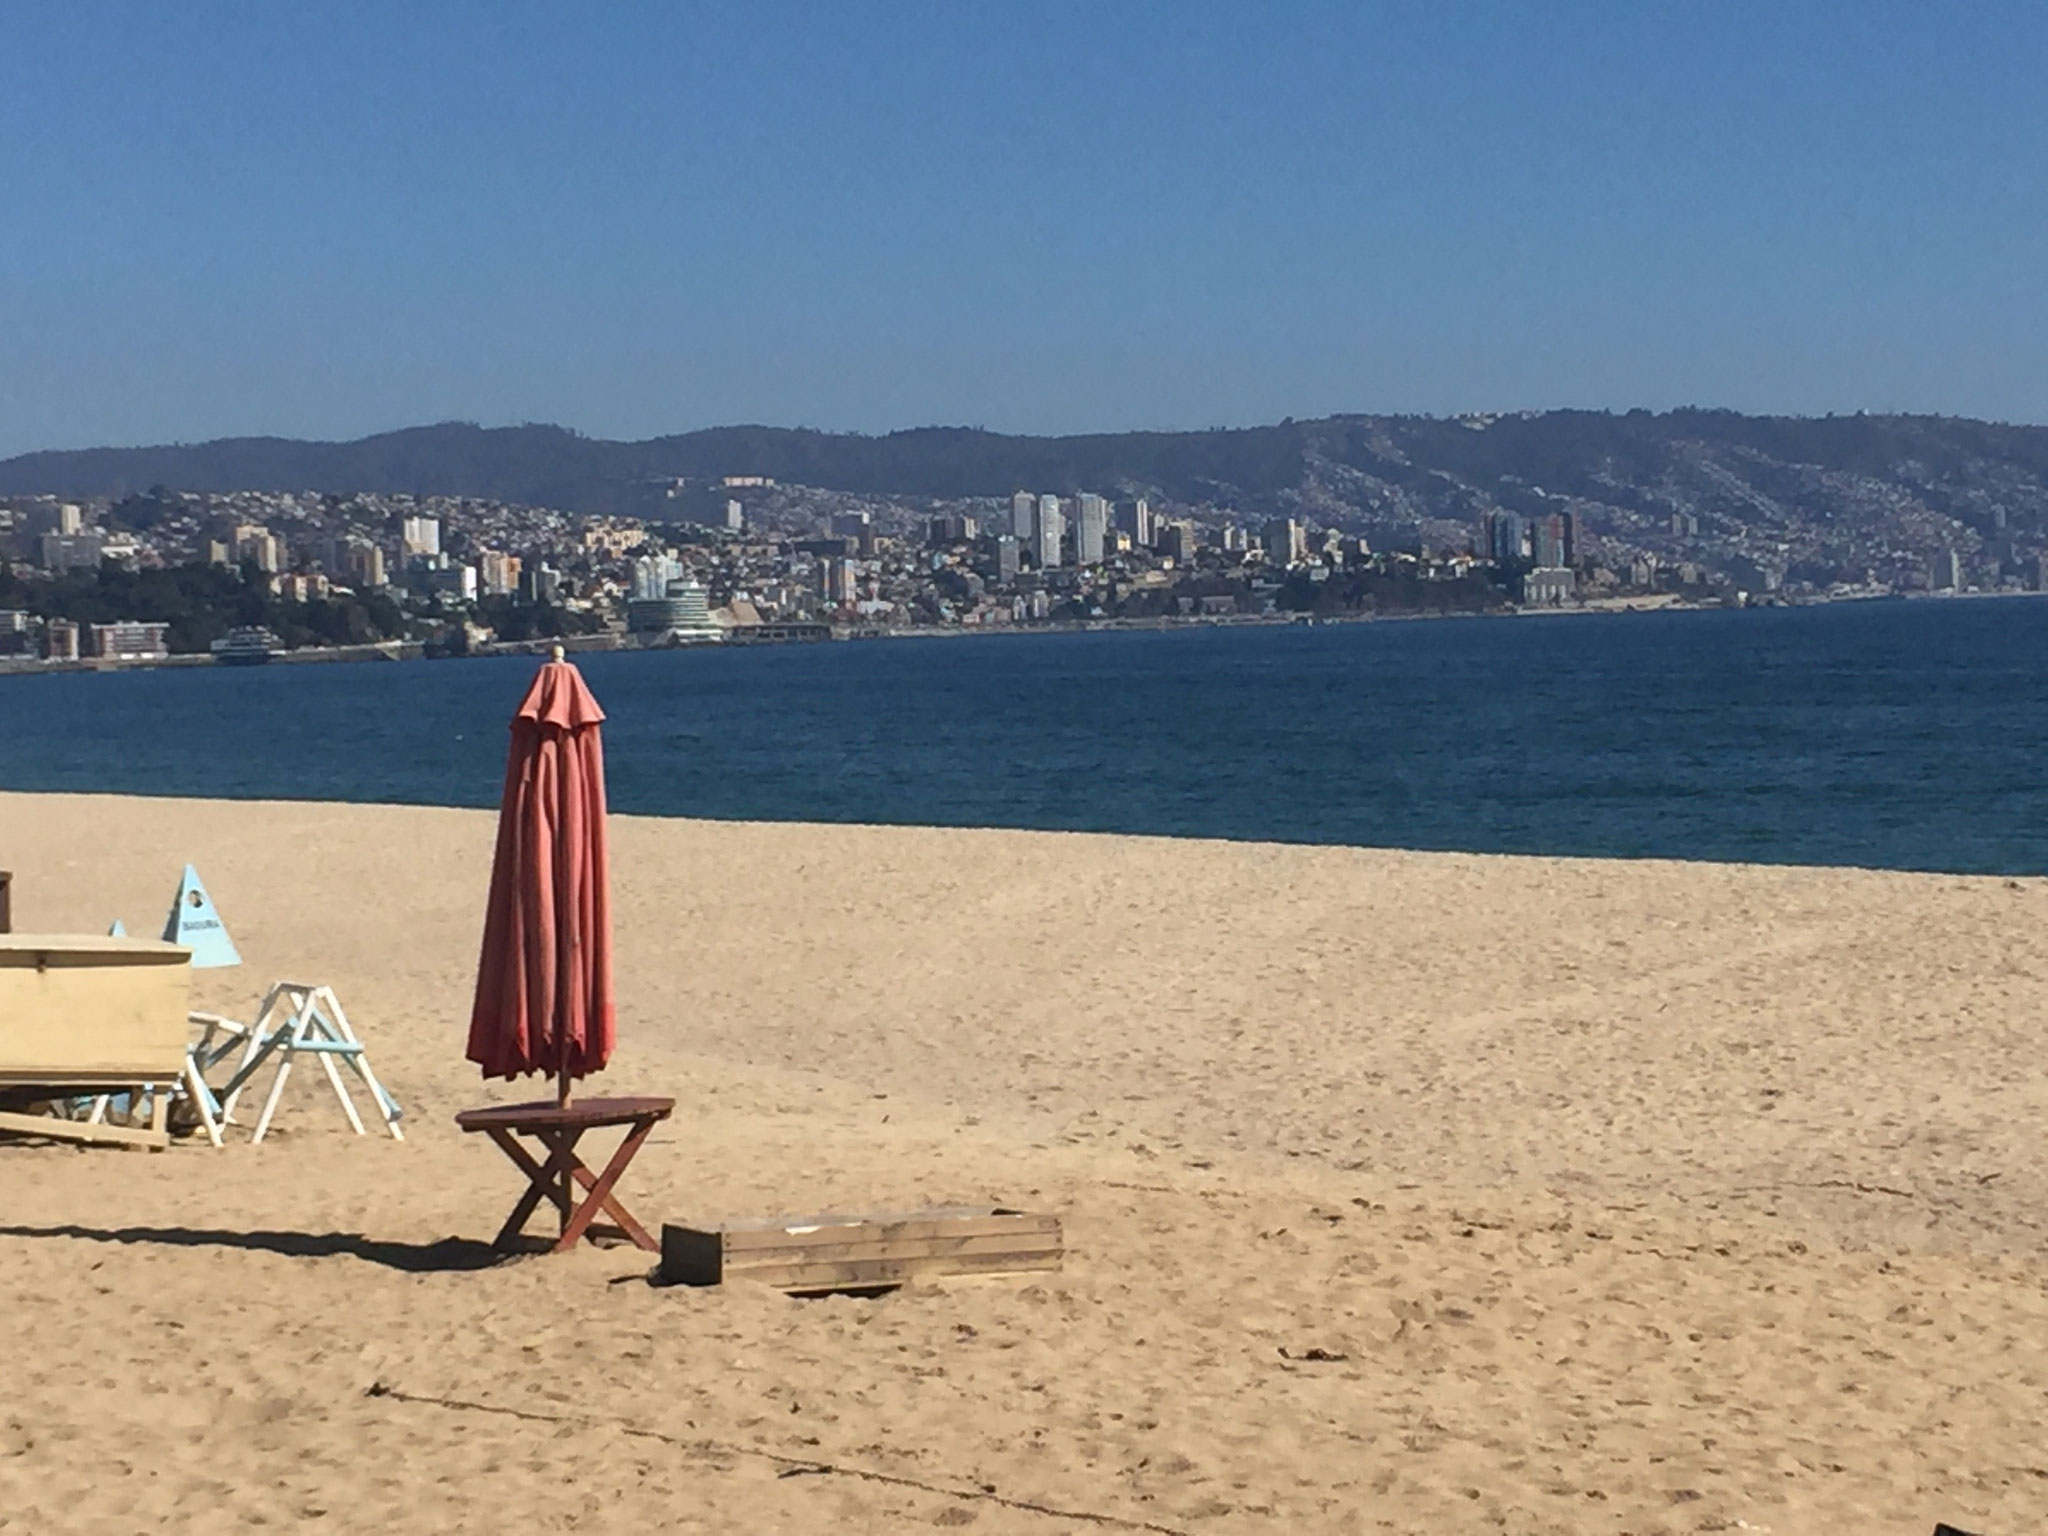 Vina del Mar, Übernachtungsplatz am Strand